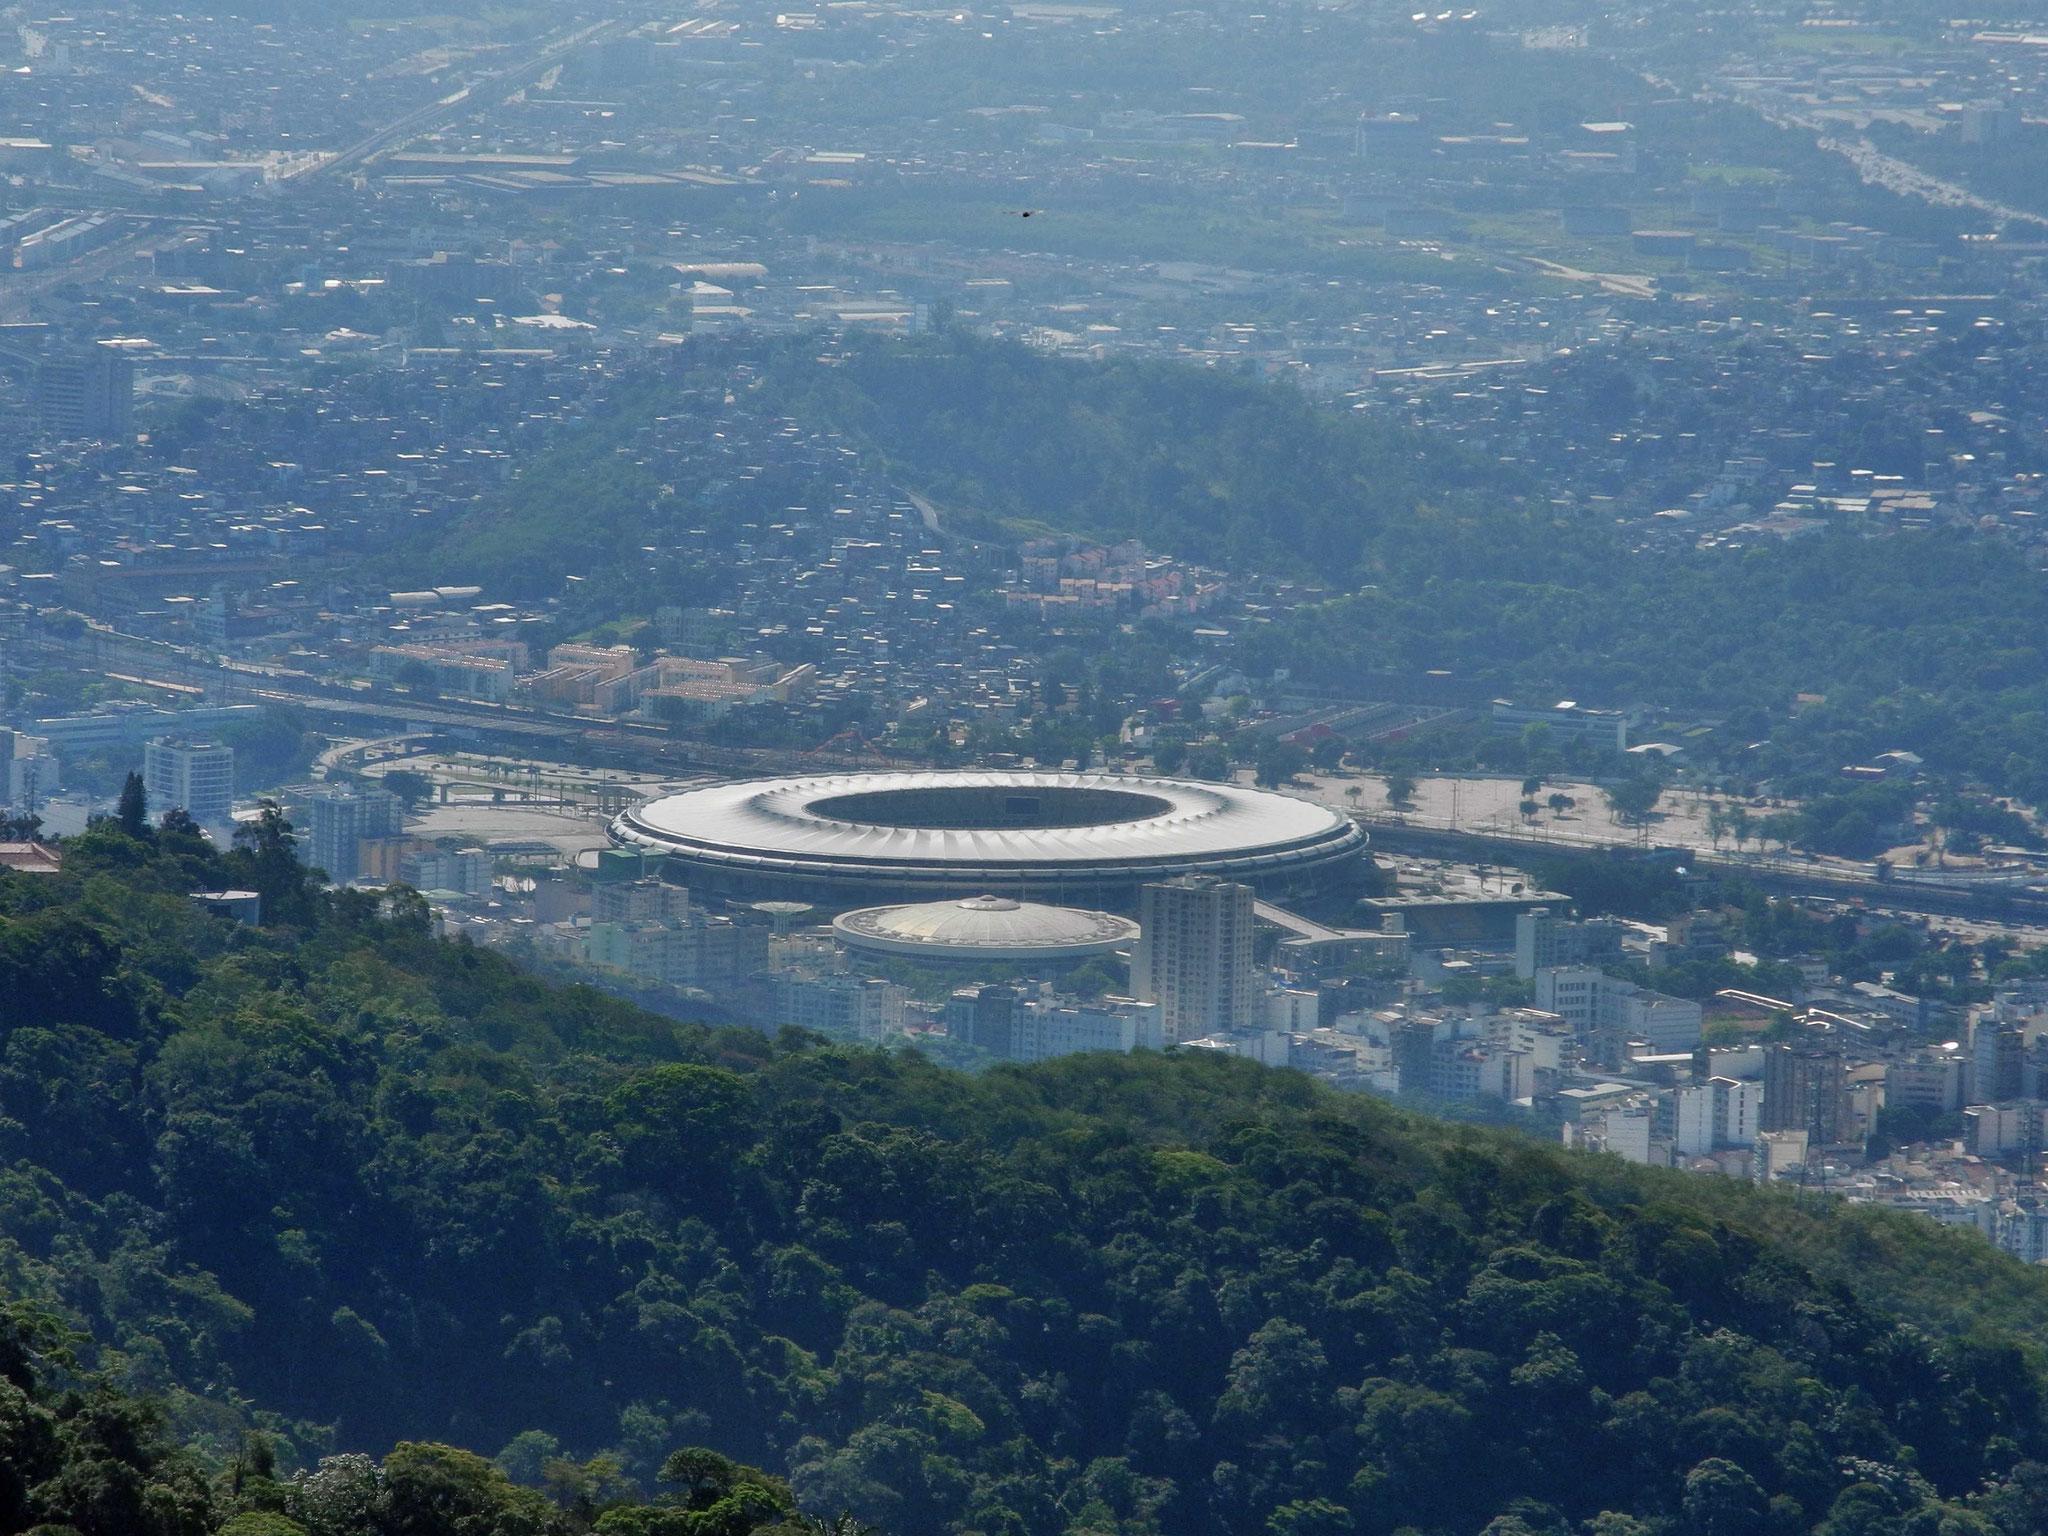 Das Maracanastadion